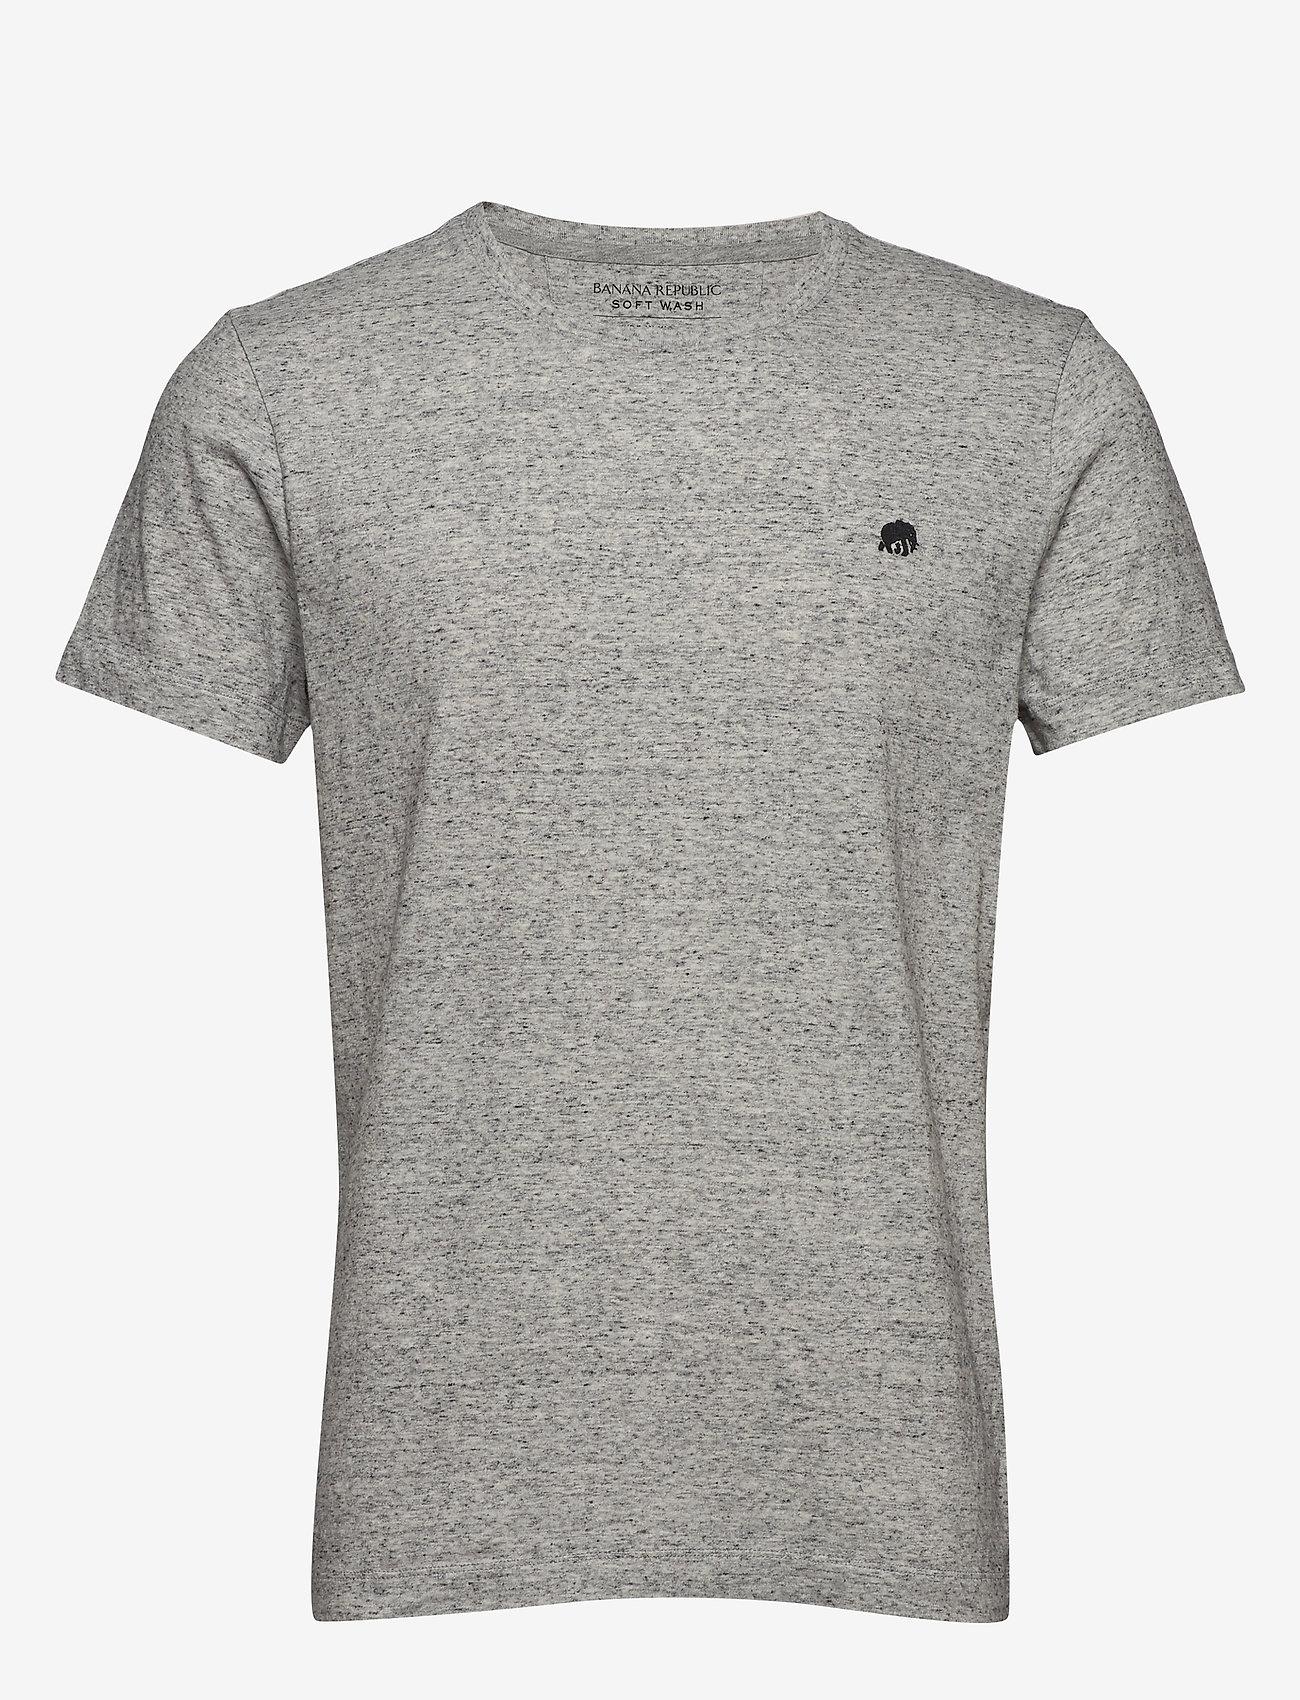 Banana Republic - I LOGO SOFTWASH TEE II - basic t-shirts - smoking grey global - 0